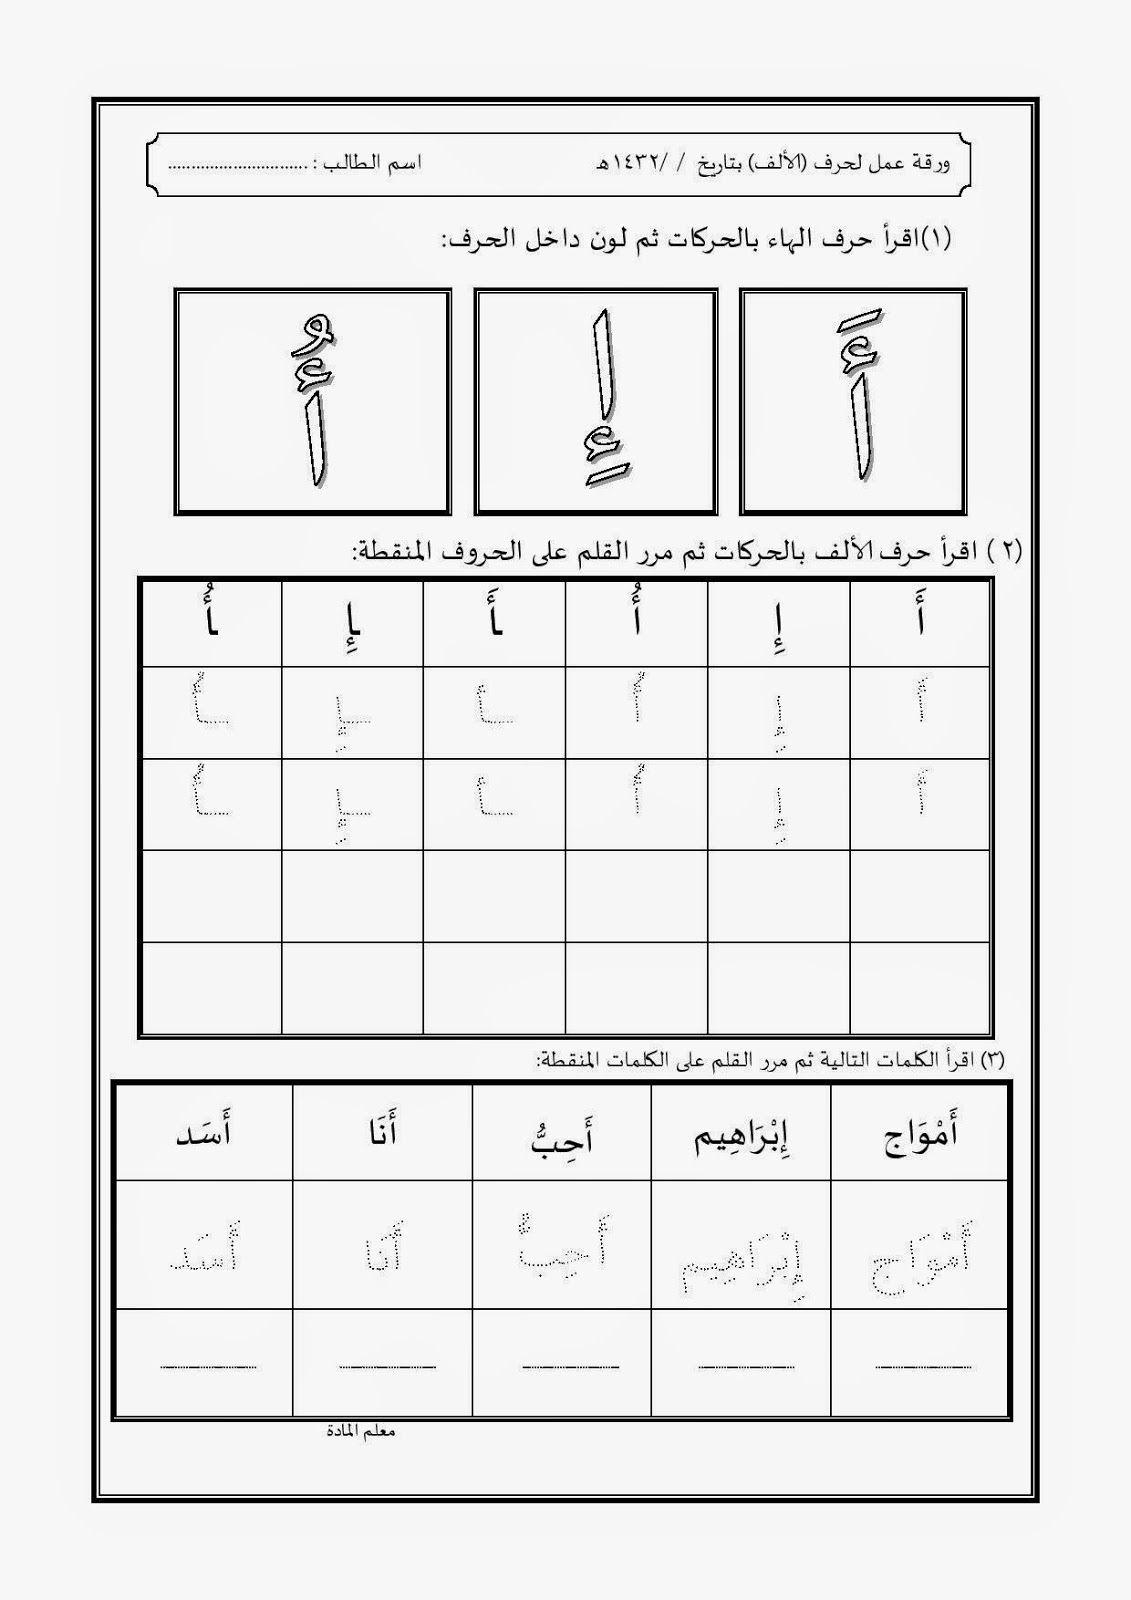 Kg2 لغة عربية روضة العلم للاطفال Learn Arabic Alphabet Arabic Alphabet For Kids Arabic Worksheets